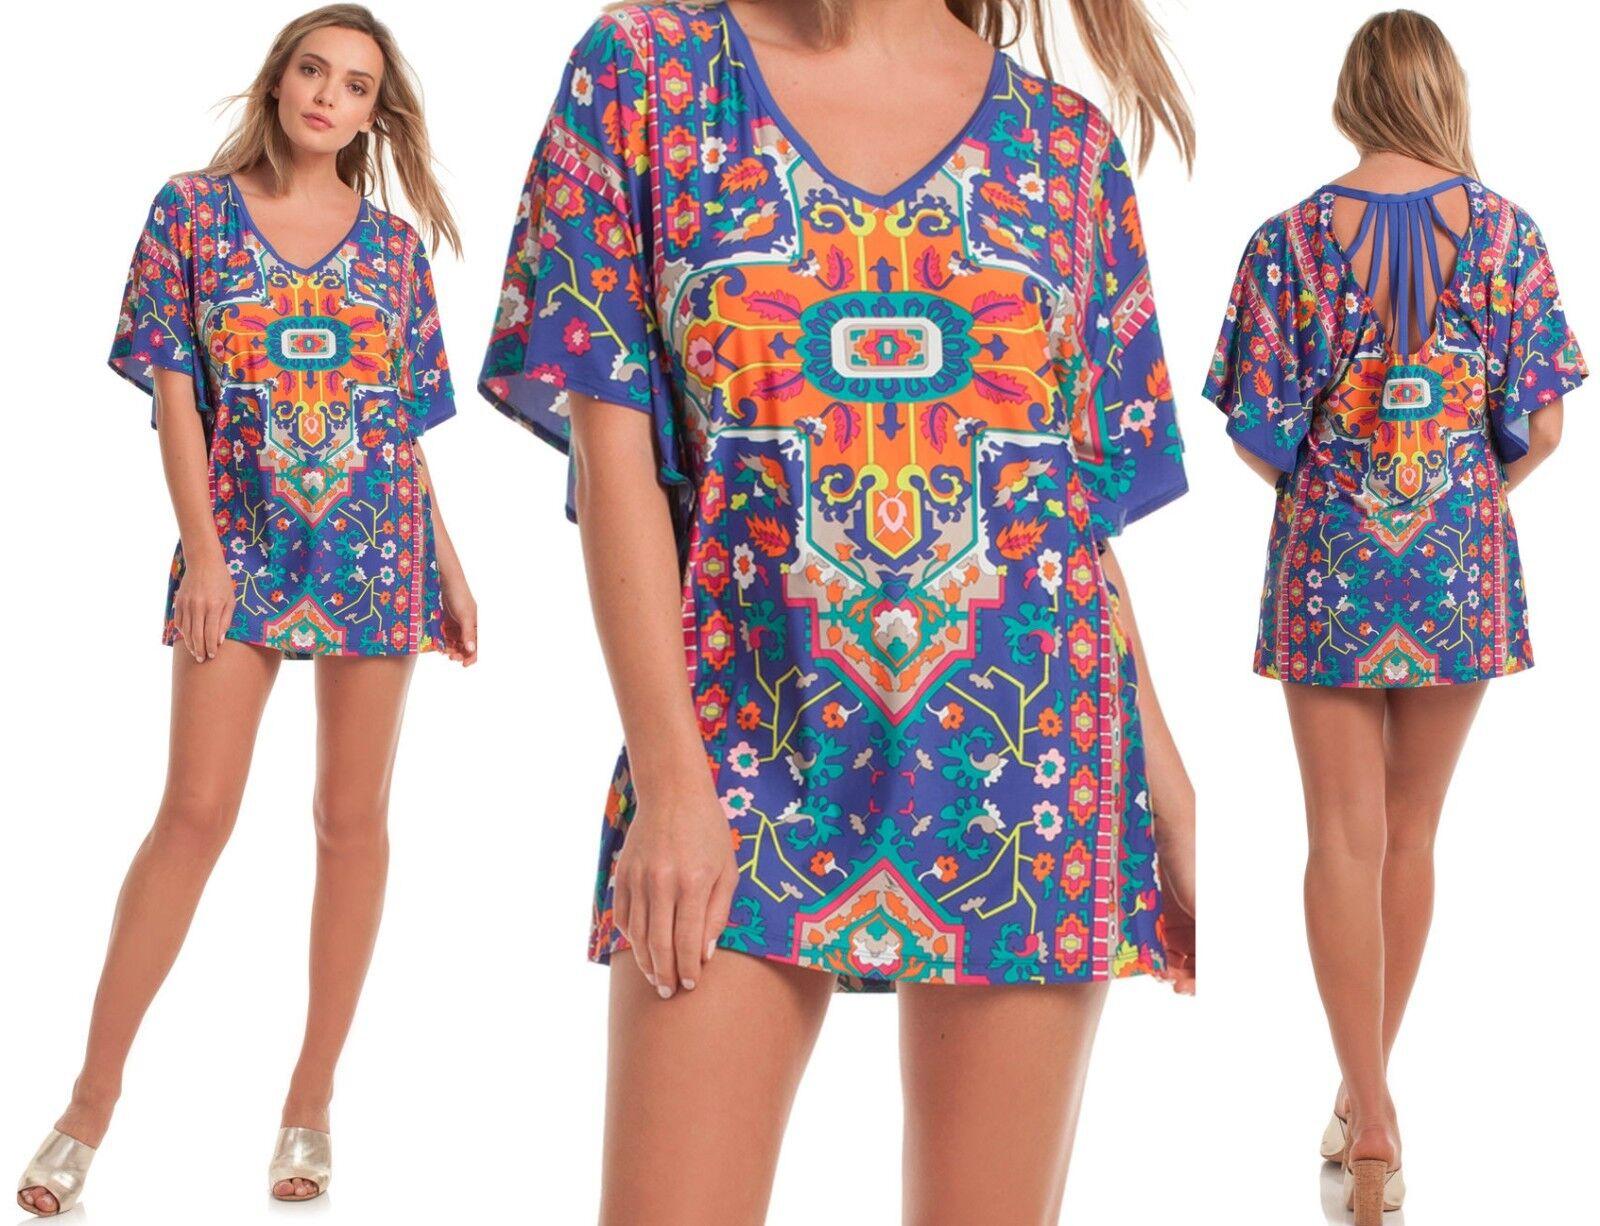 140 Trina Turk Tapestry Multi Print Stretch Jersey Cover Up Tunic Dress